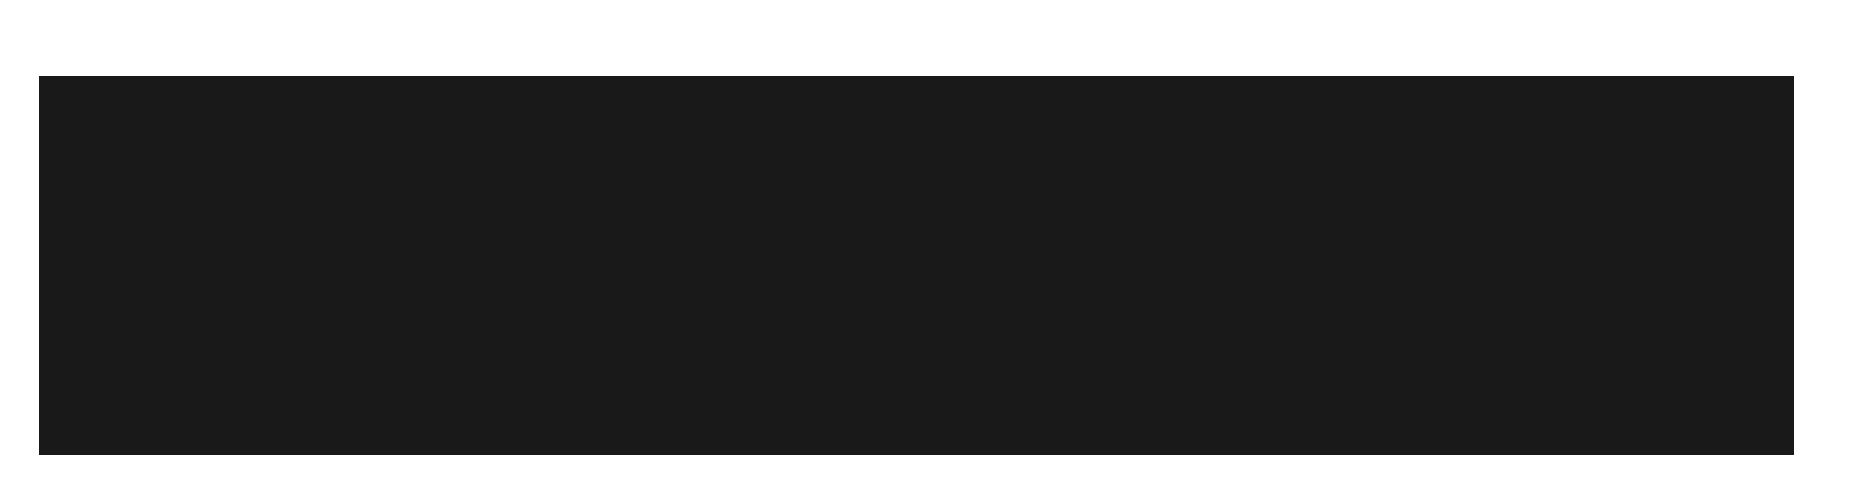 Thompsons logo black white